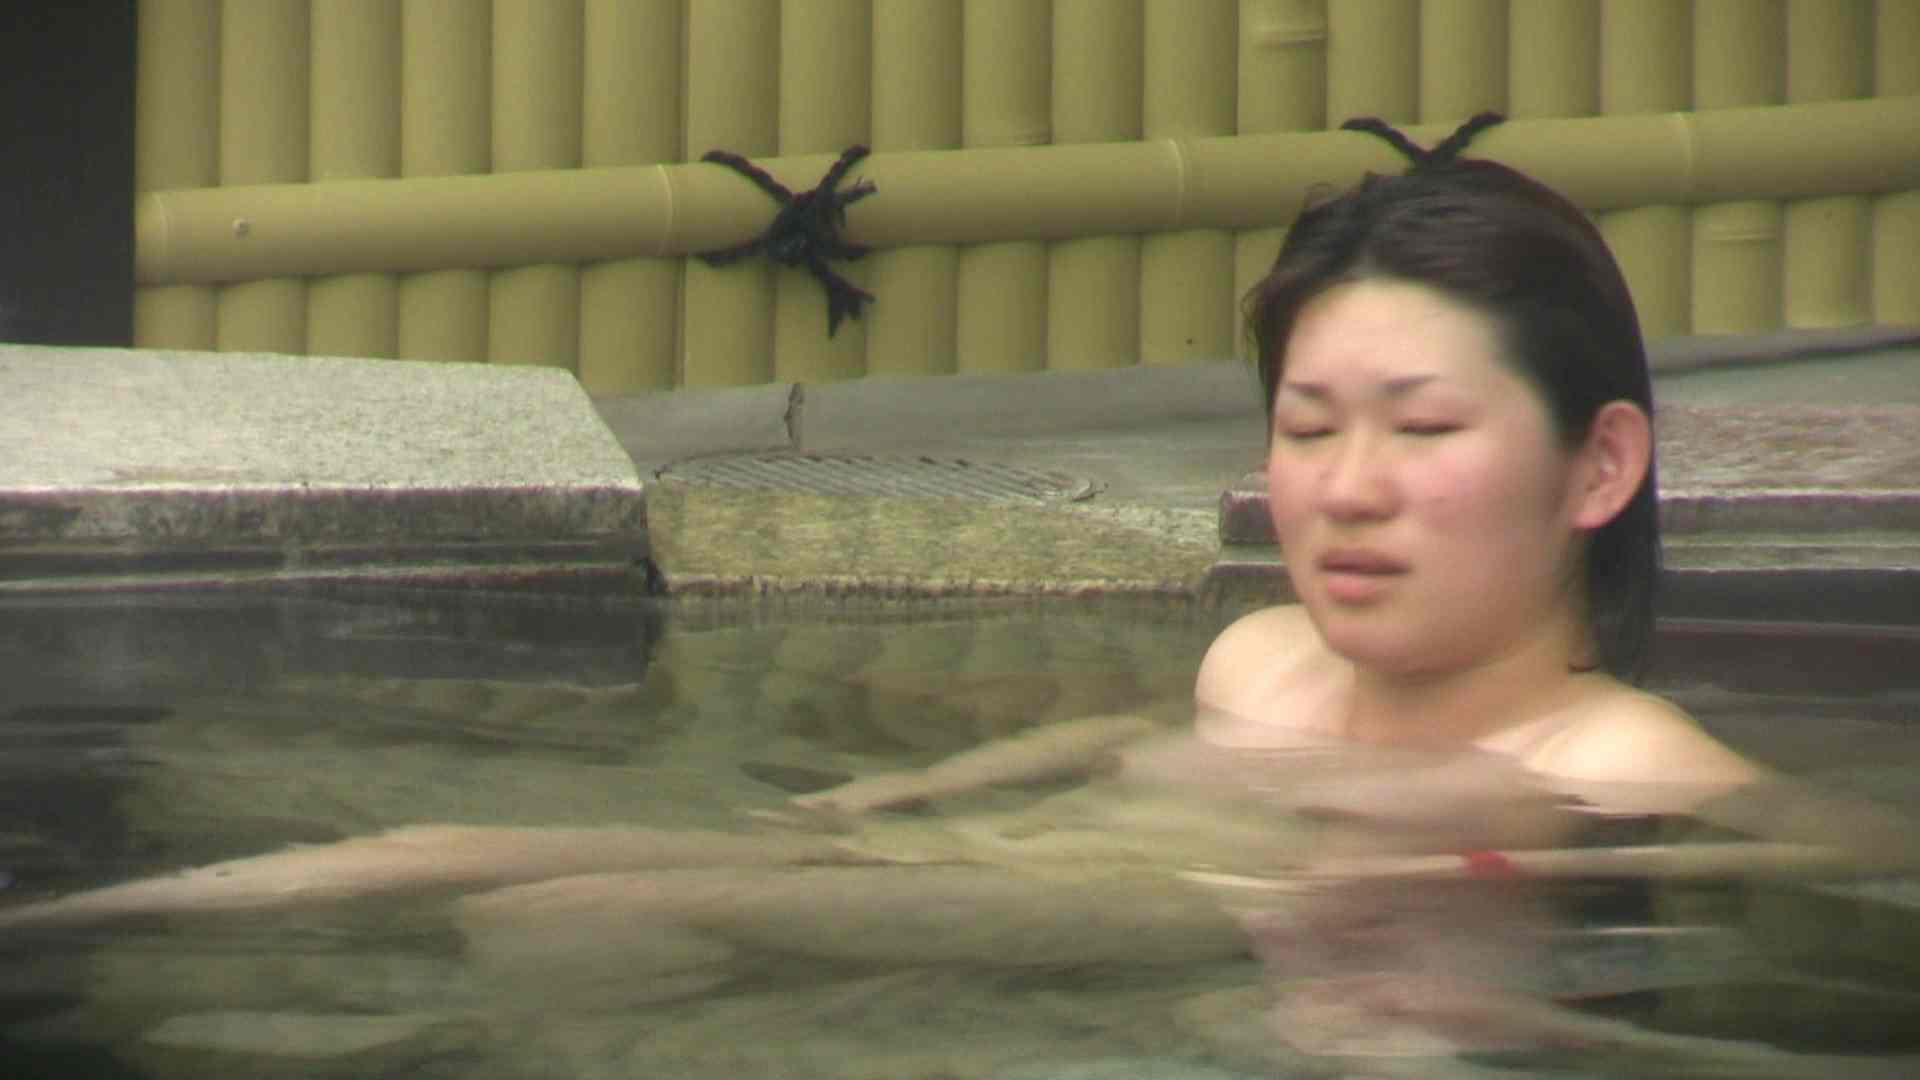 Aquaな露天風呂Vol.673 露天風呂 | OLのエロ生活  45連発 31